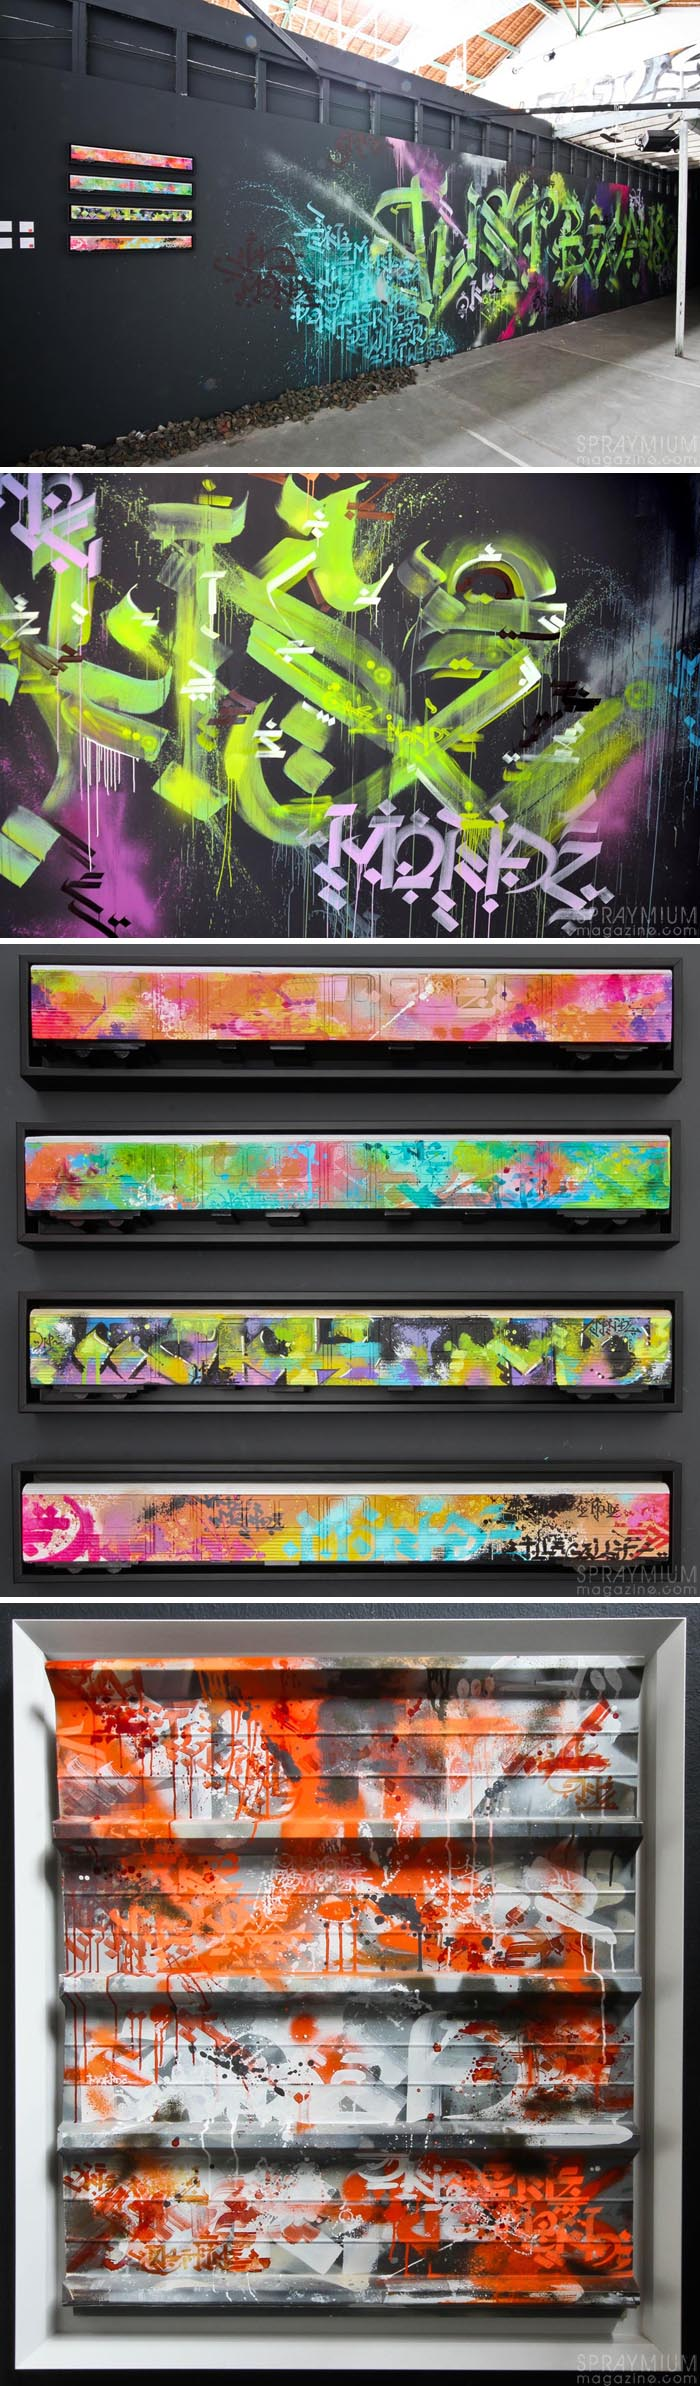 exposition mister freeze toulouse art urbain contemporain graffiti postgraffiti streetart muralism spraymium mondé